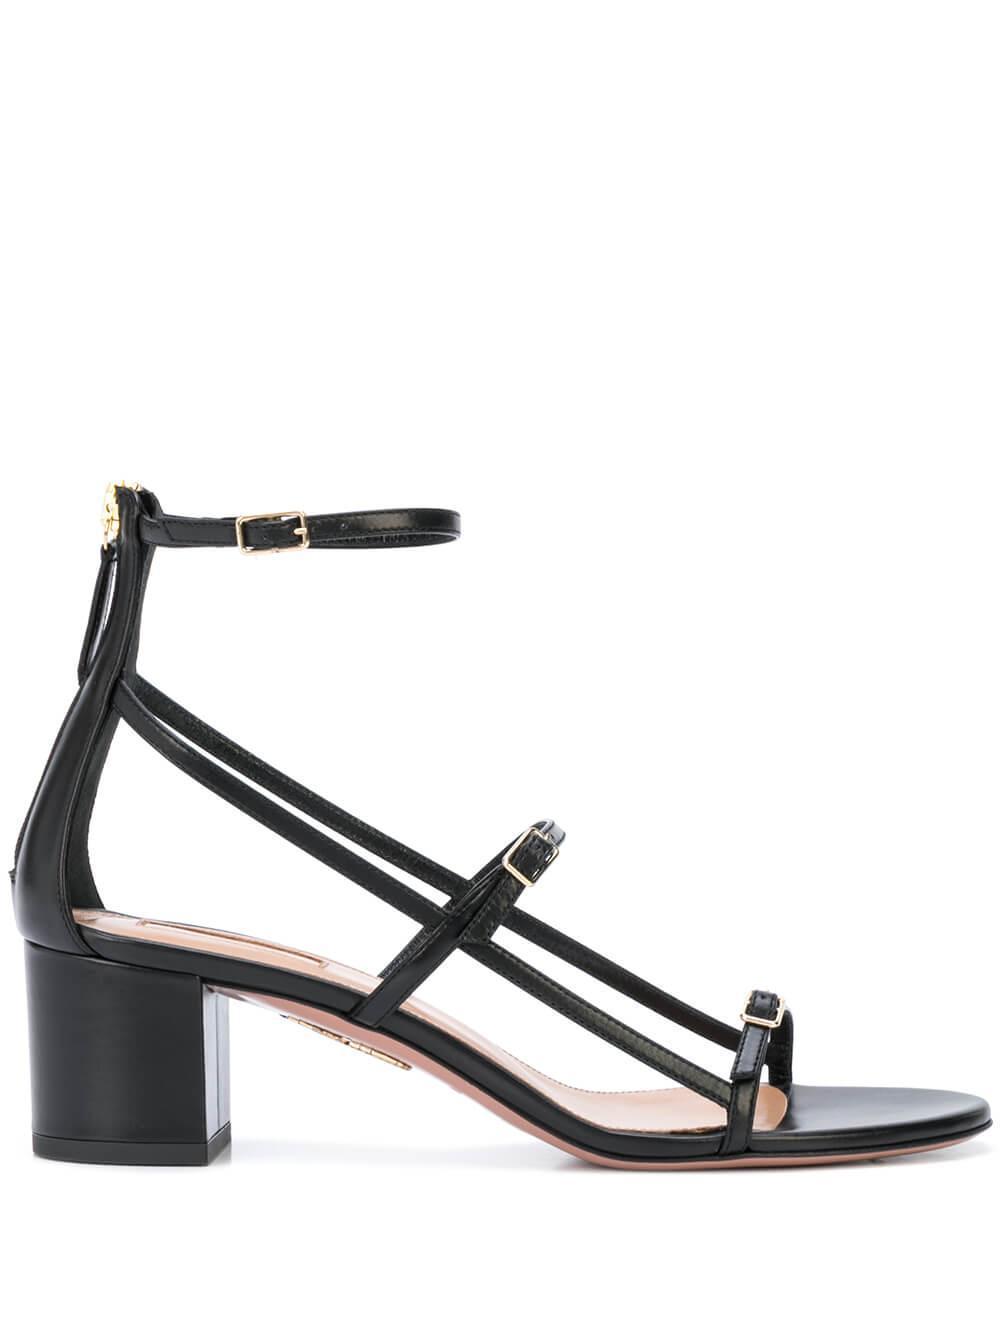 Super Model 50mm Block Heel Leather Sandal Item # SMOMIDS0-CAL